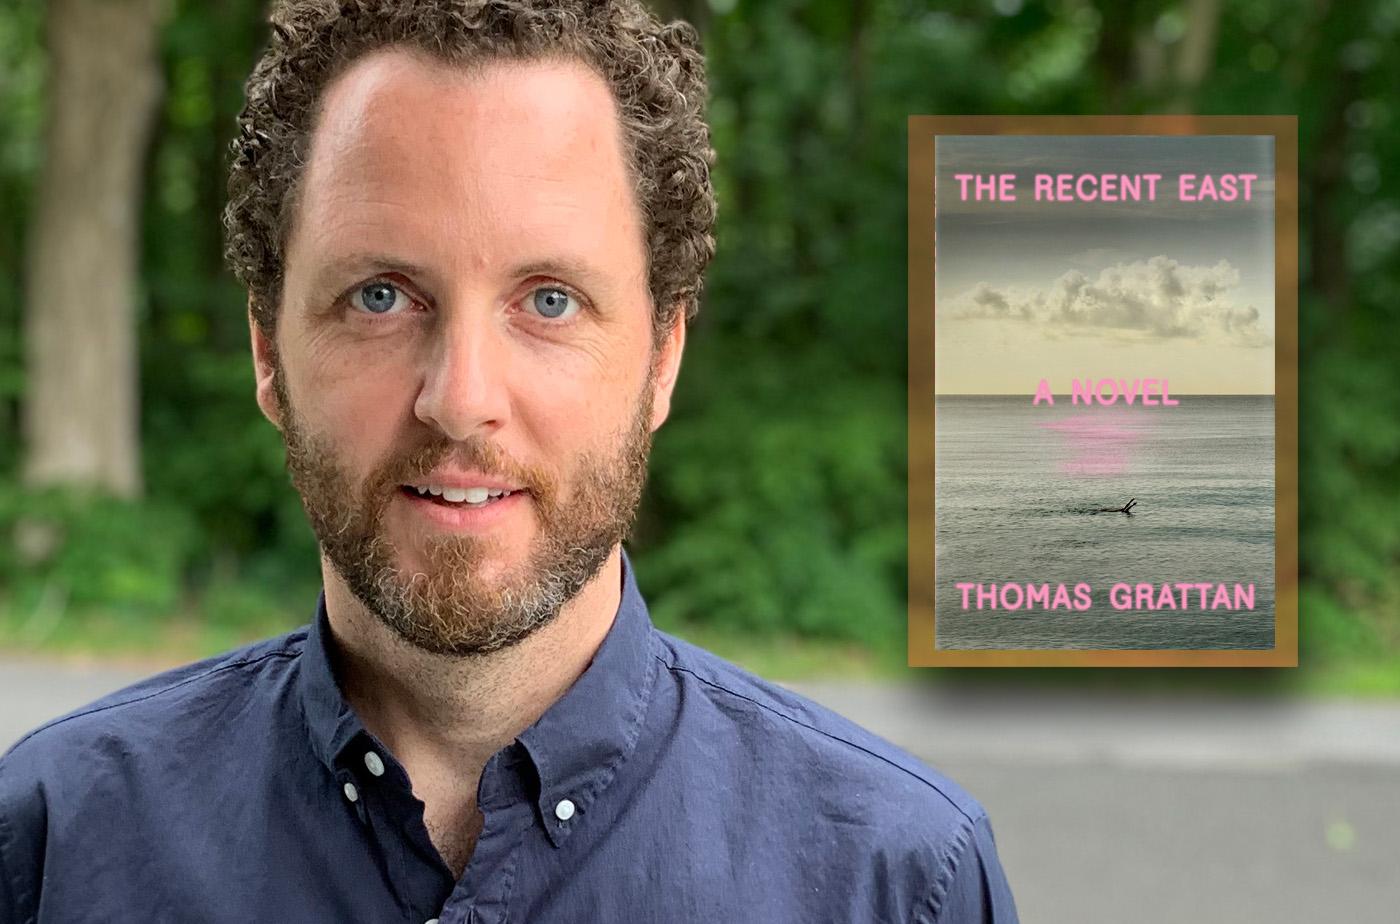 Catapult online classes: Thomas Grattan, 6-Week Online Fiction Workshop: Moving Through Time, Fiction, Workshop